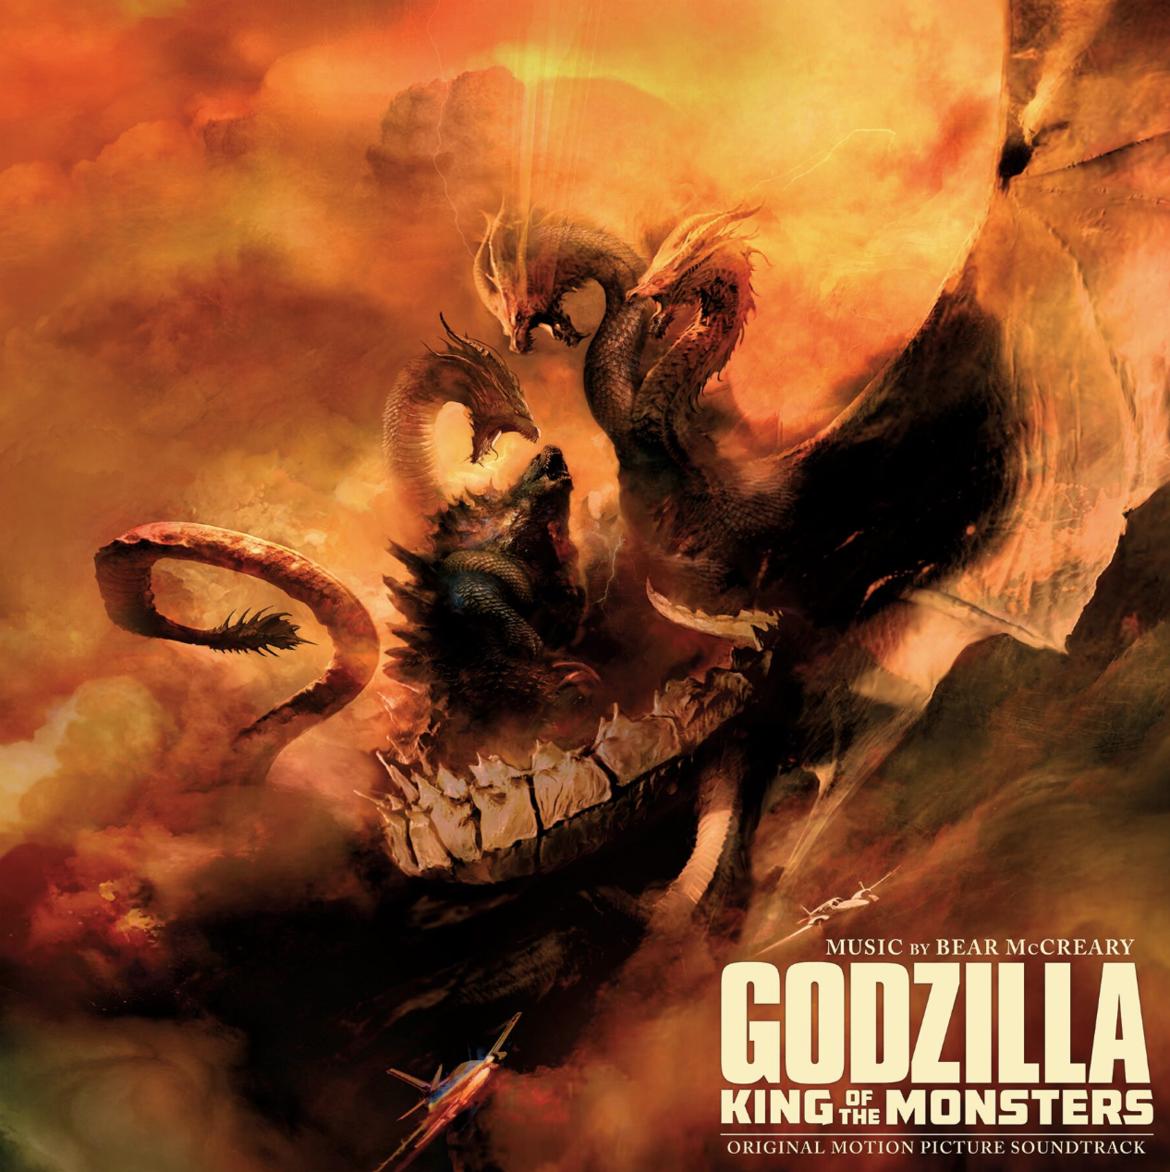 Waxwork's vinyl score for Bear McCreary's Godzilla: King of